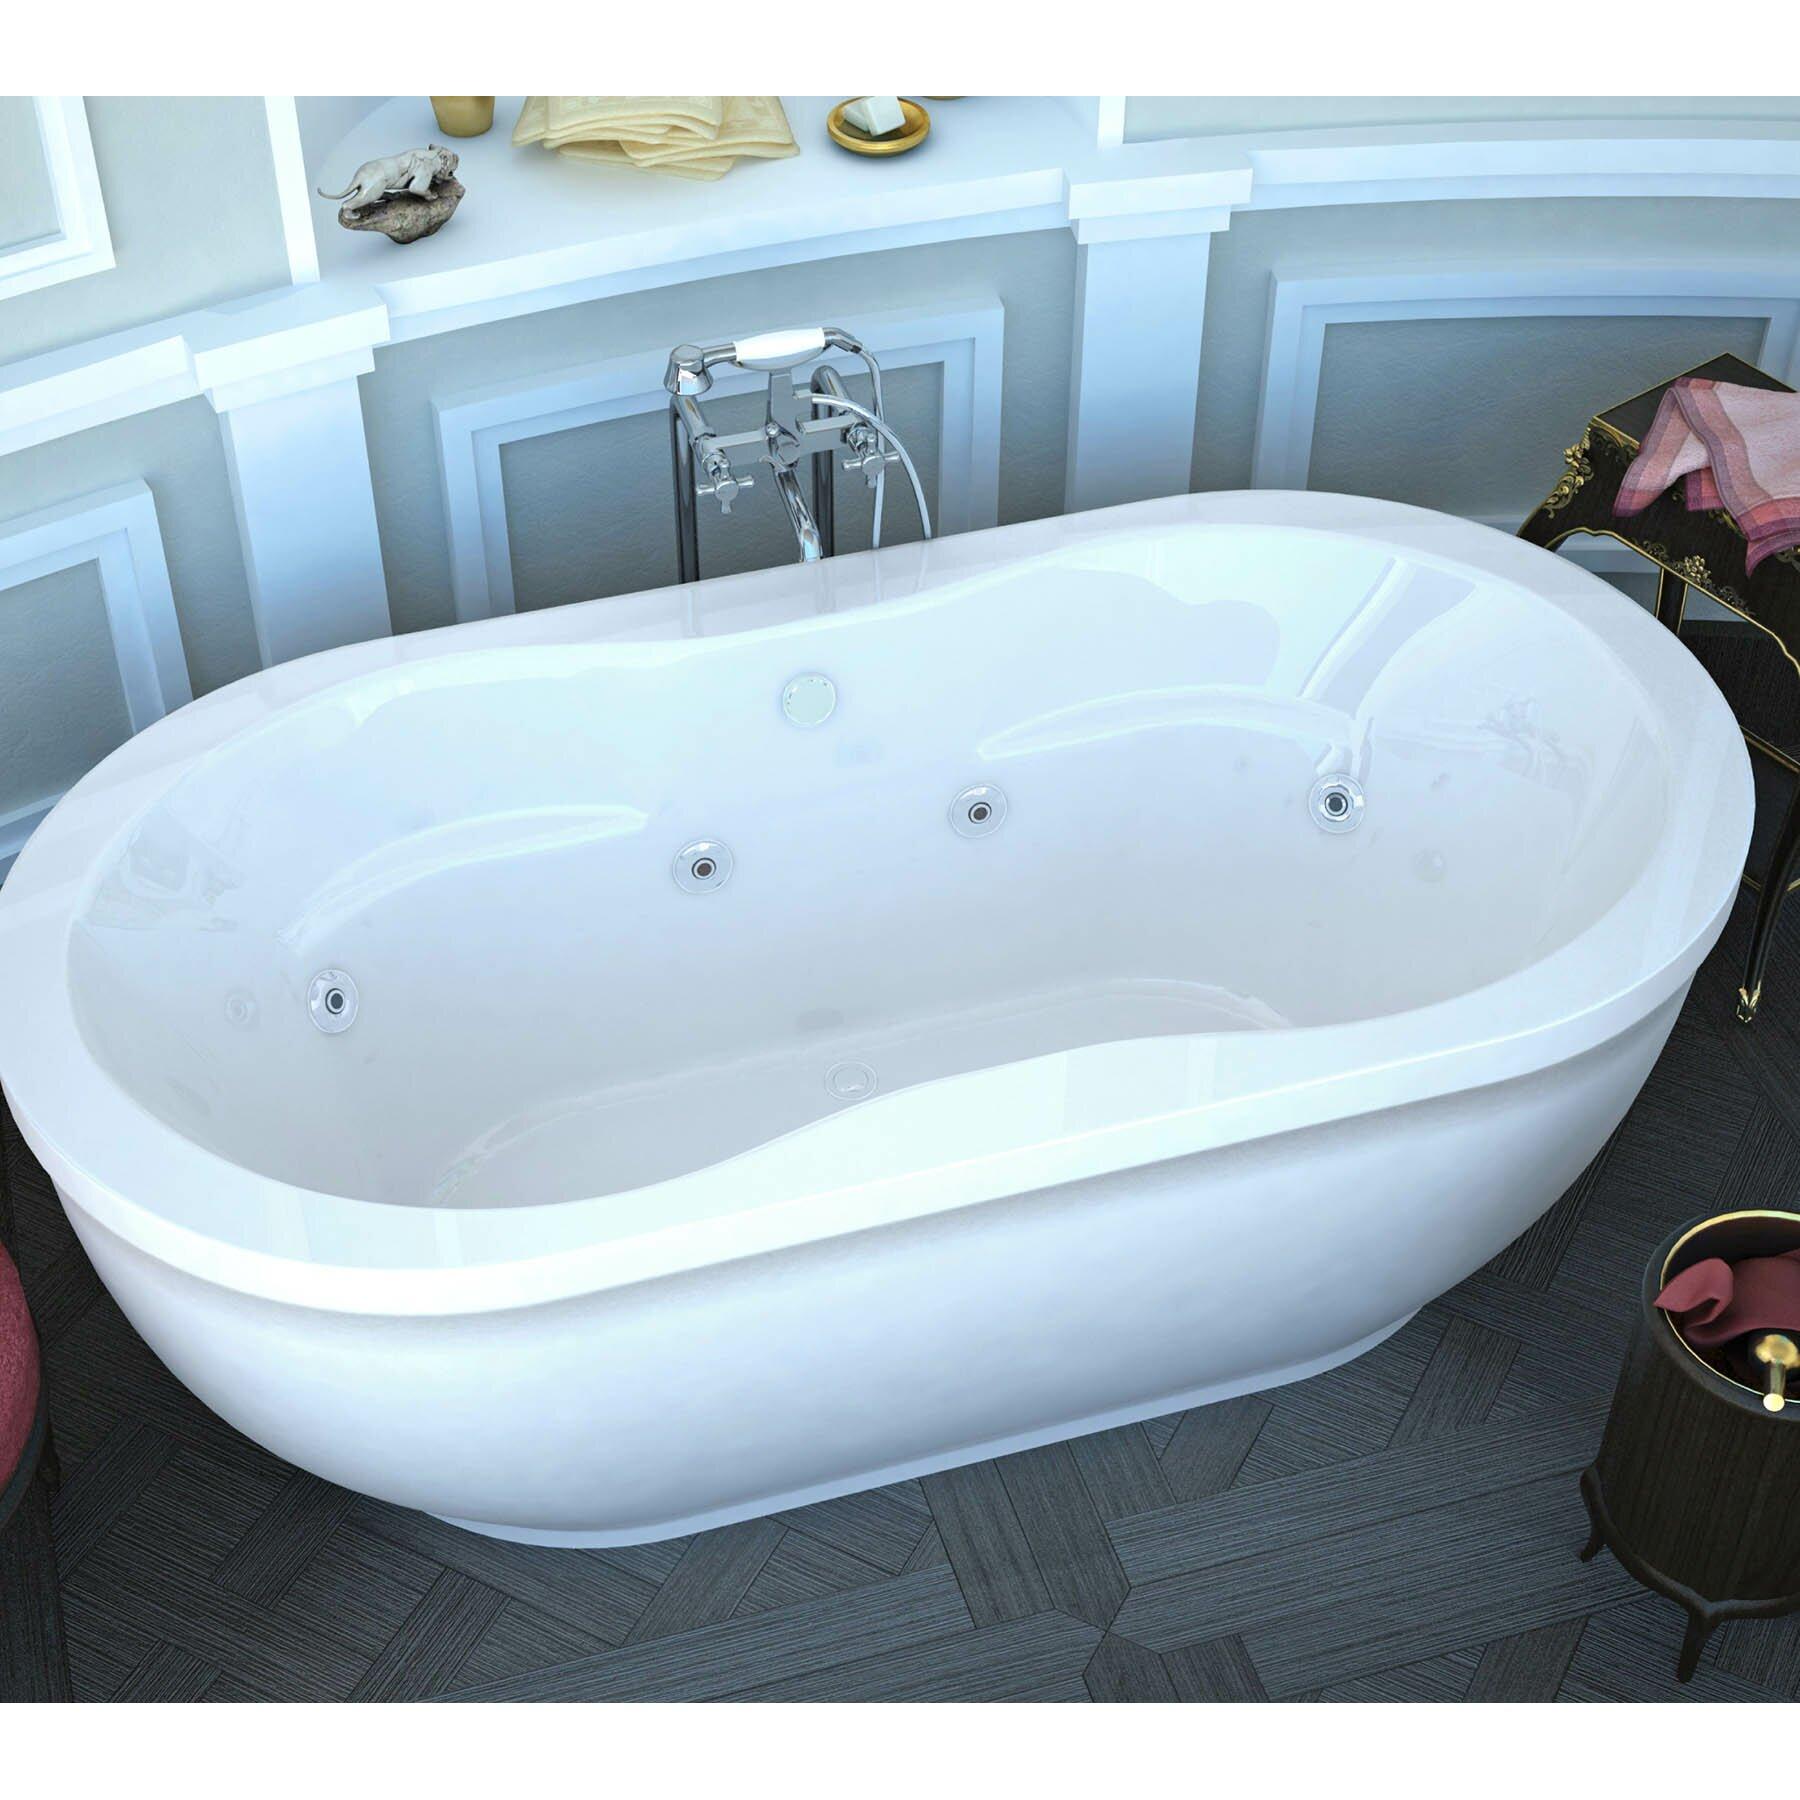 Spa Escapes Vivara  X  Freestanding Bathtub  Reviews - Corner garden tub dimensions